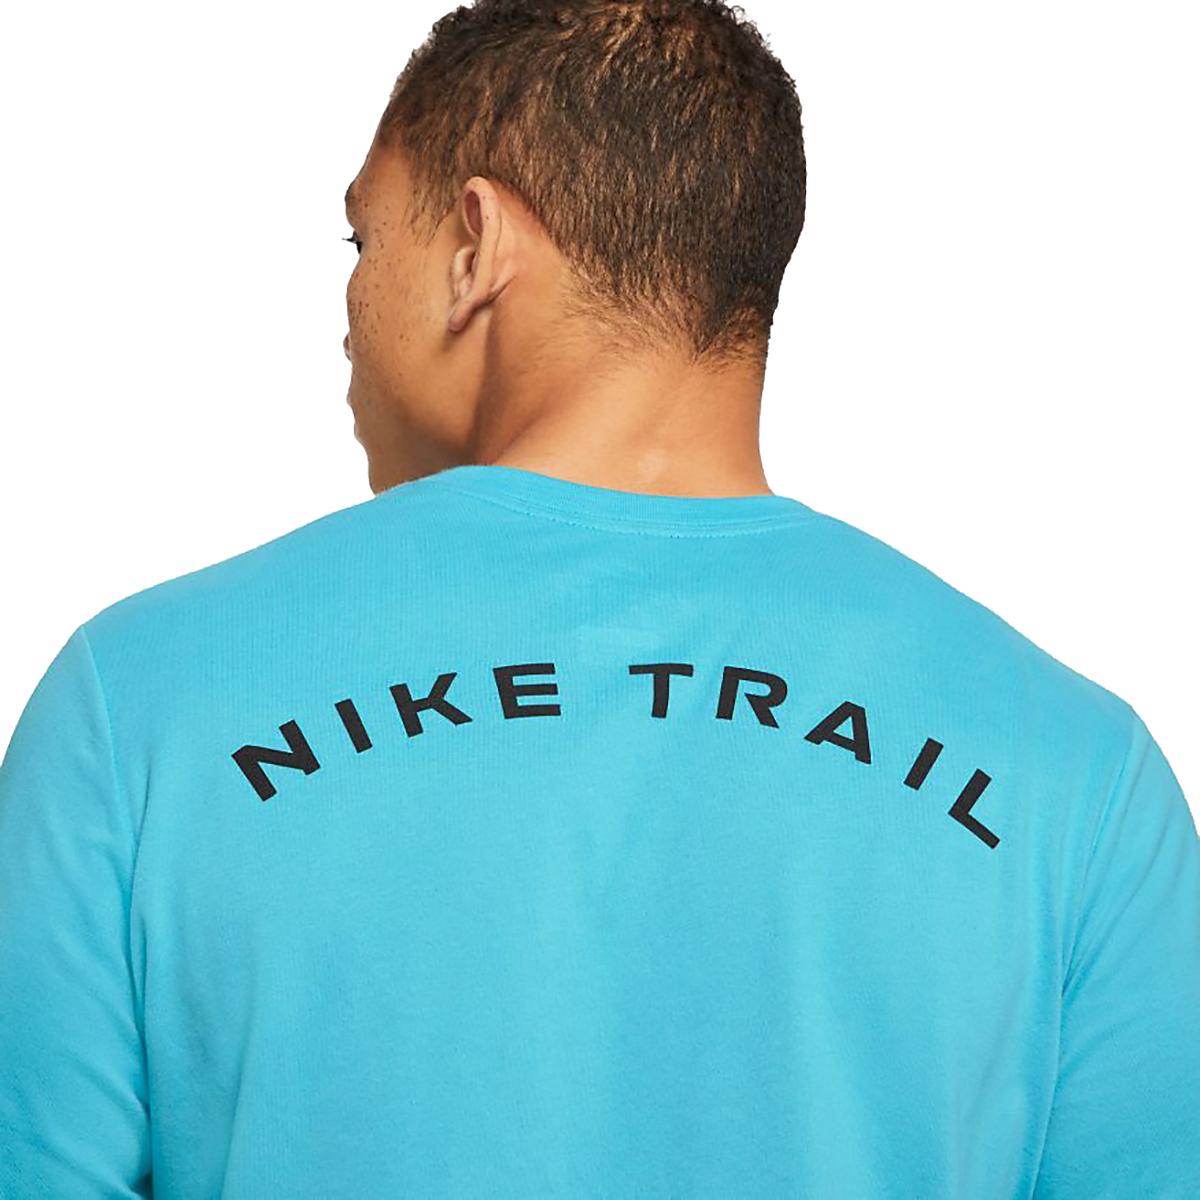 Men's Nike Dri-FIT Long-Sleeve Trail Running T-Shirt - Color: Chlorine Blue - Size: XS, Chlorine Blue, large, image 4